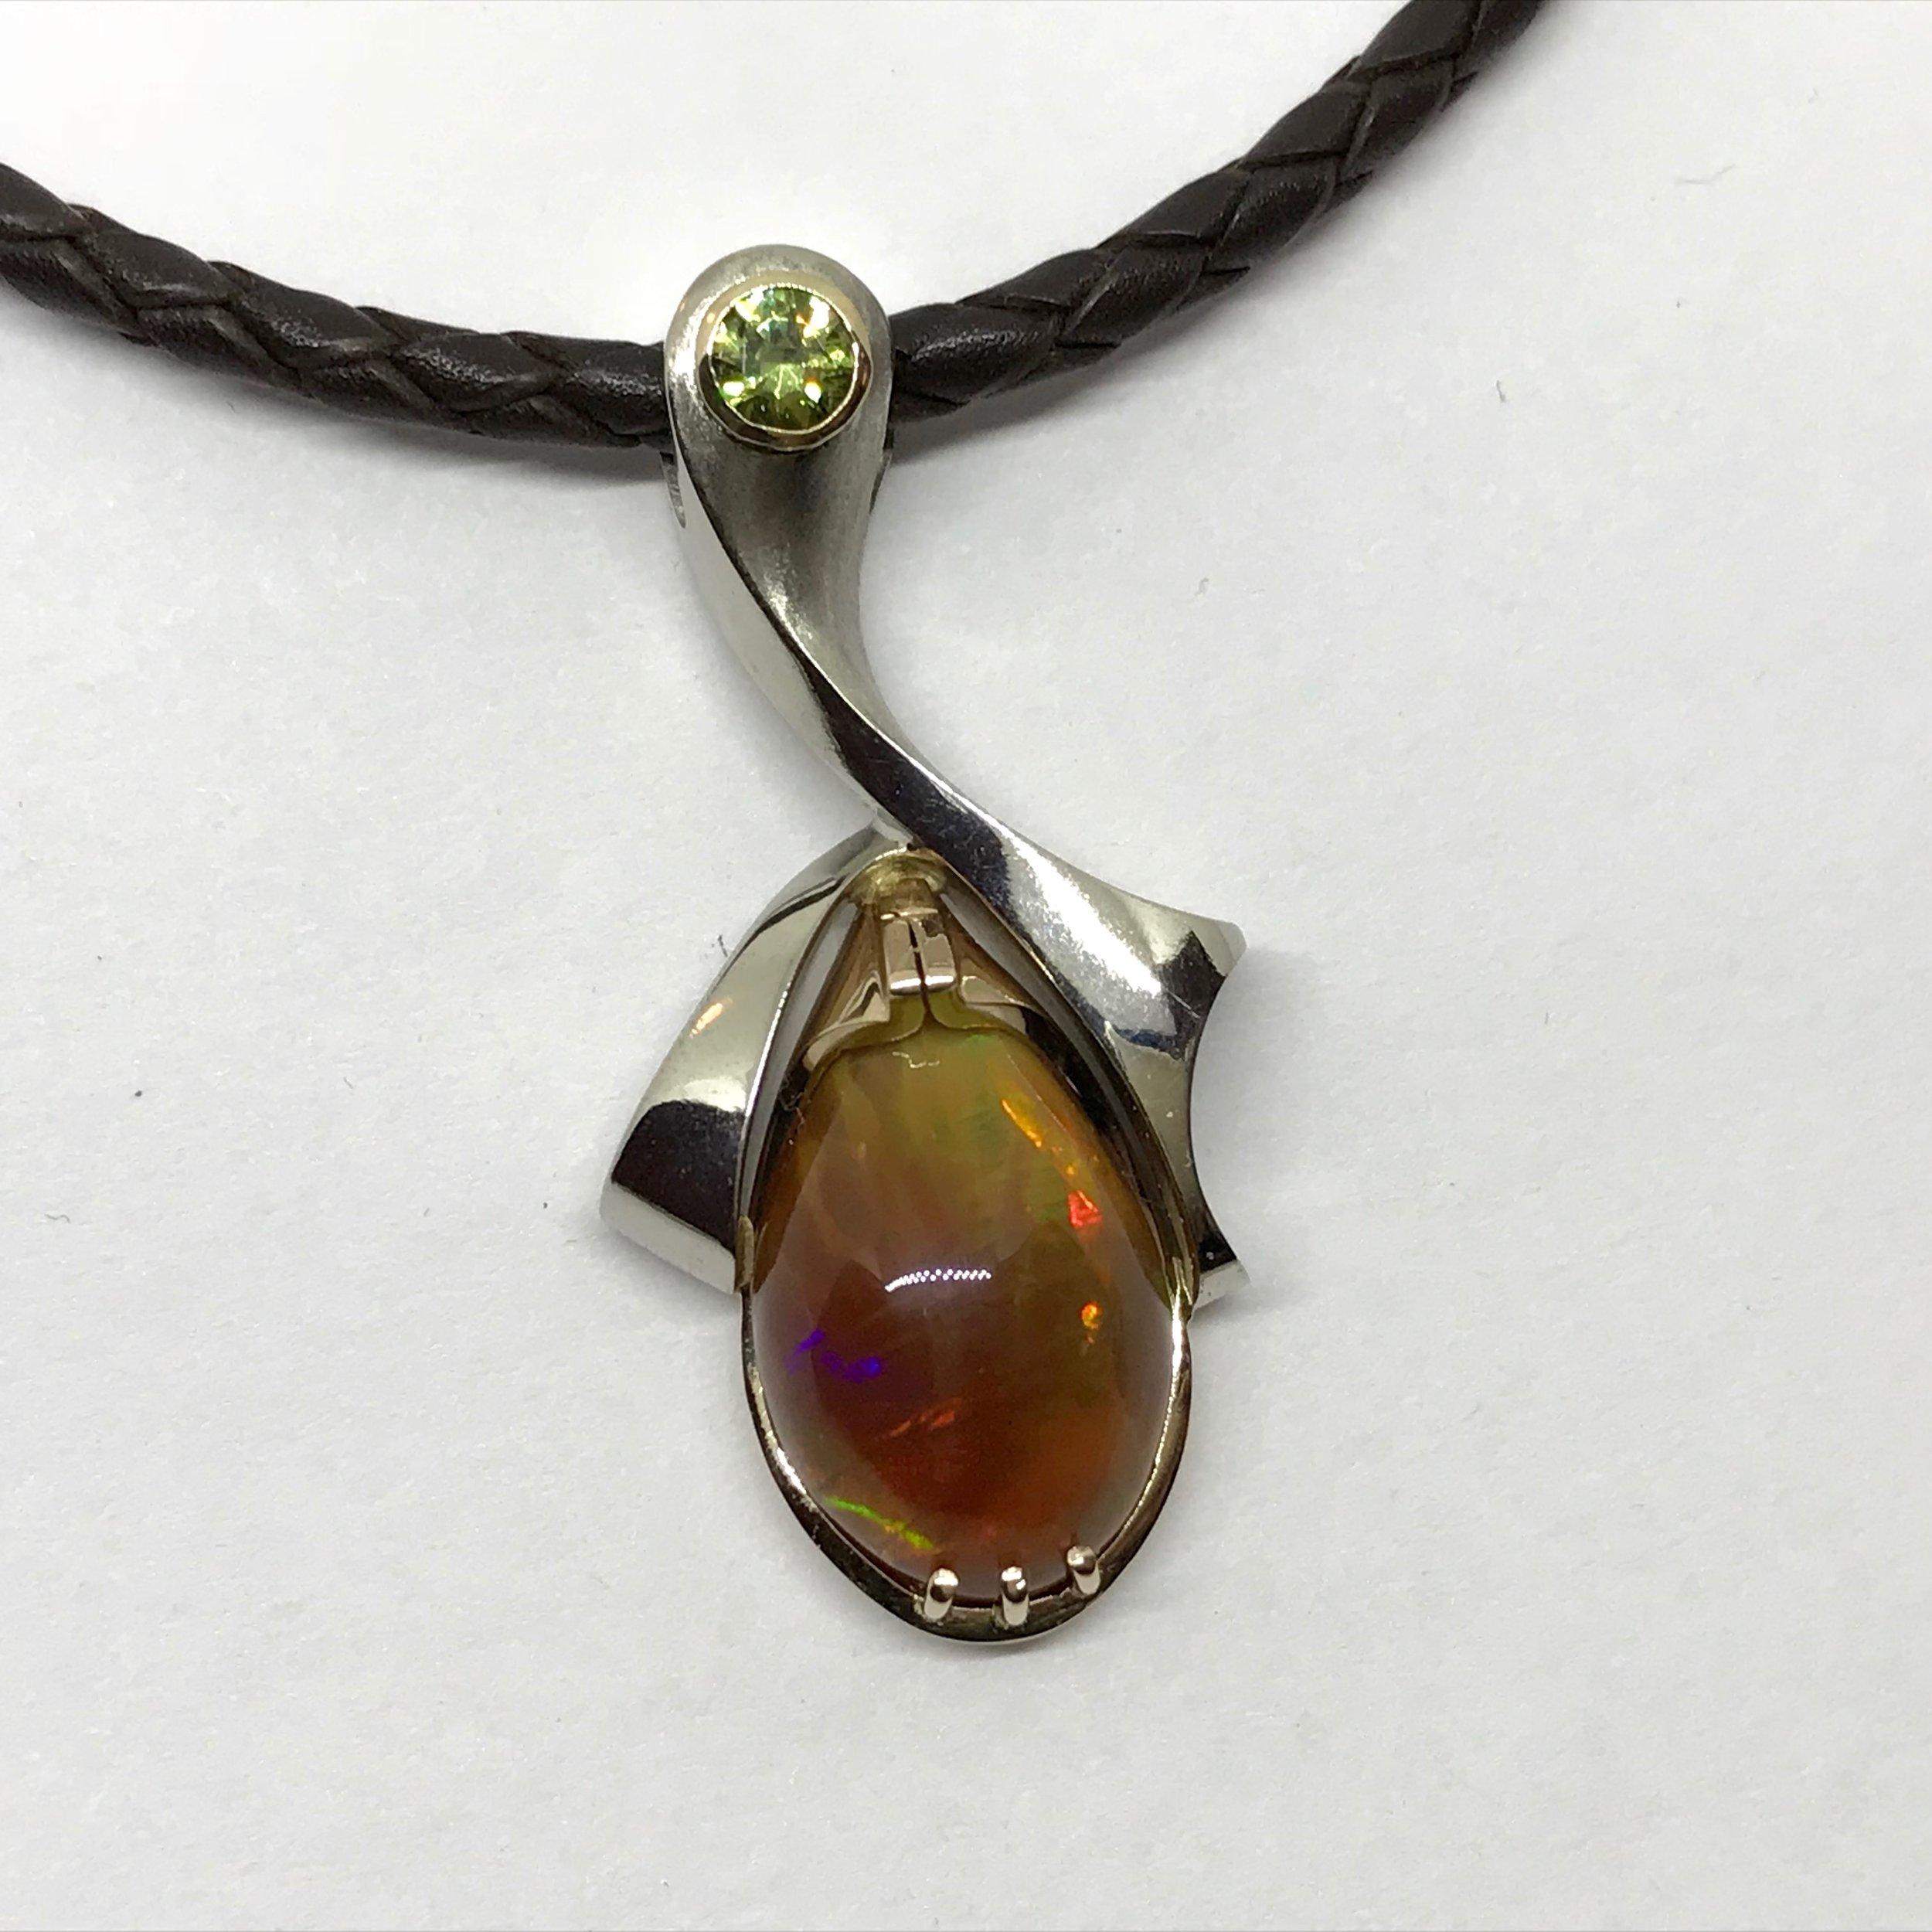 NEW ITEM <br><b>Fire Opal Pendant</b><br>reg.RT: $4,285/Special: $3,642<br>14K White Gold<br>7.61ct Fire Opal<br>0.324ct Demantoid Garnet<br>Designer Series